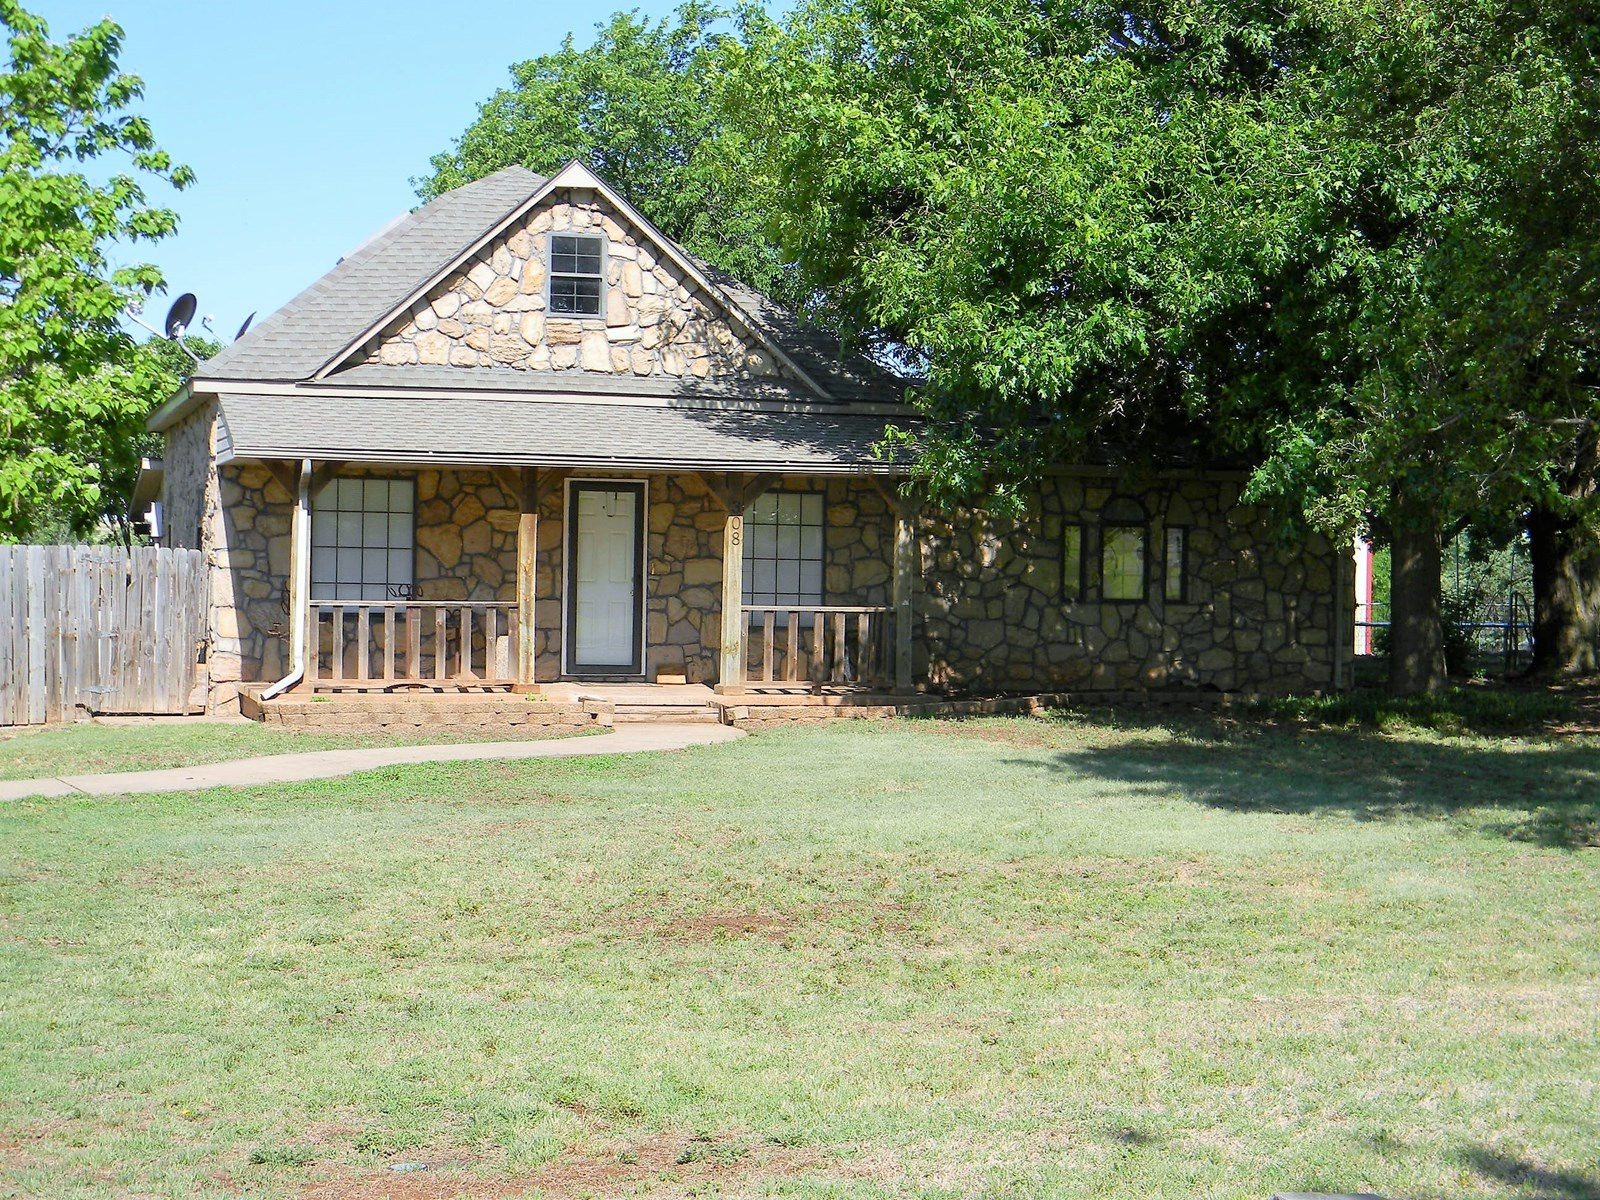 House w/ Acreage for Sale, Arapaho, OK 73620, Custer County